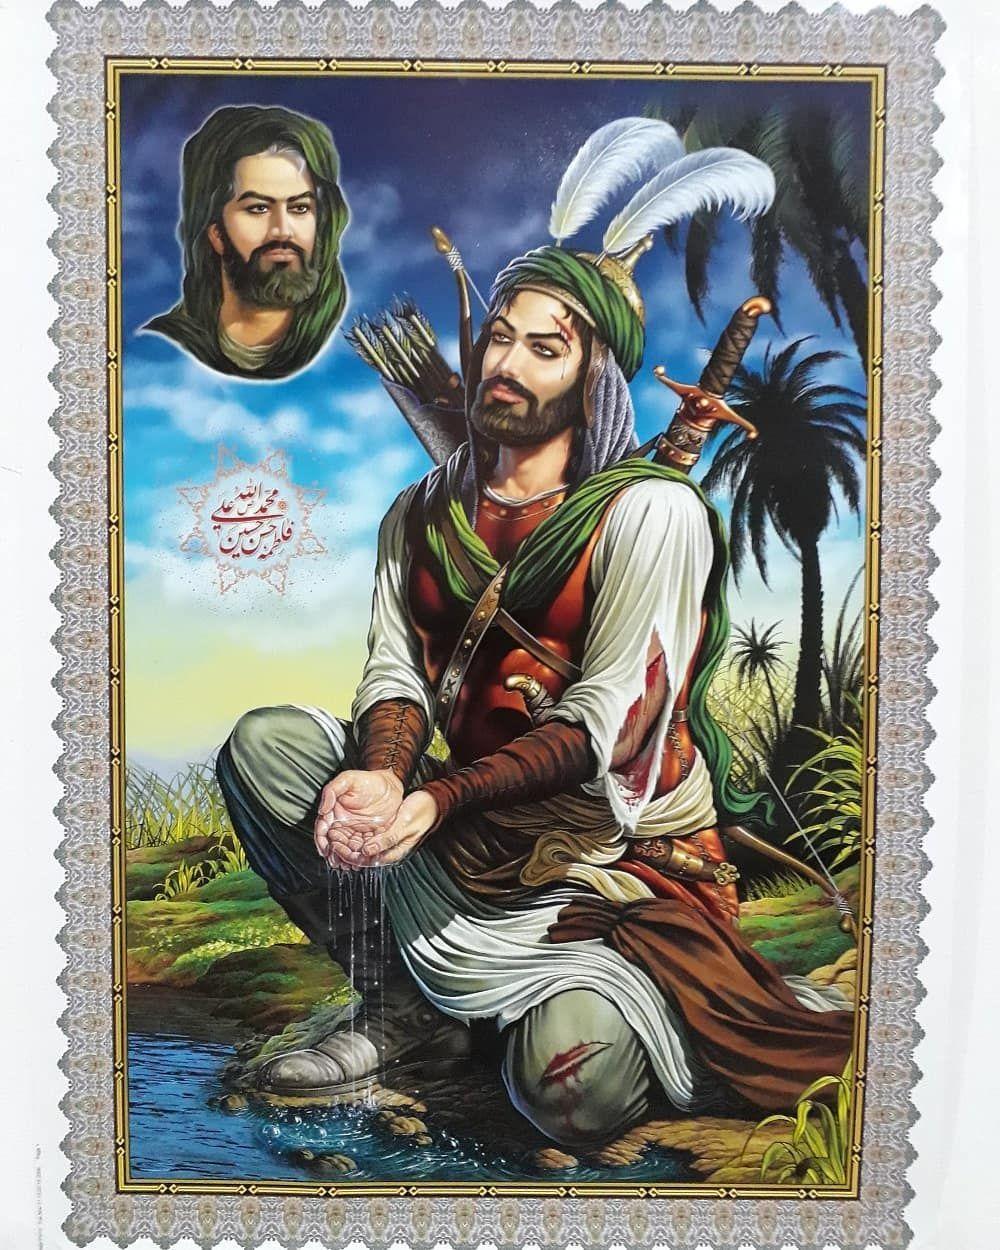 394 Likes 16 Comments علي ال خليفة الشمري Lwy313lwy On Instagram Islamic Paintings Painting Instagram Posts